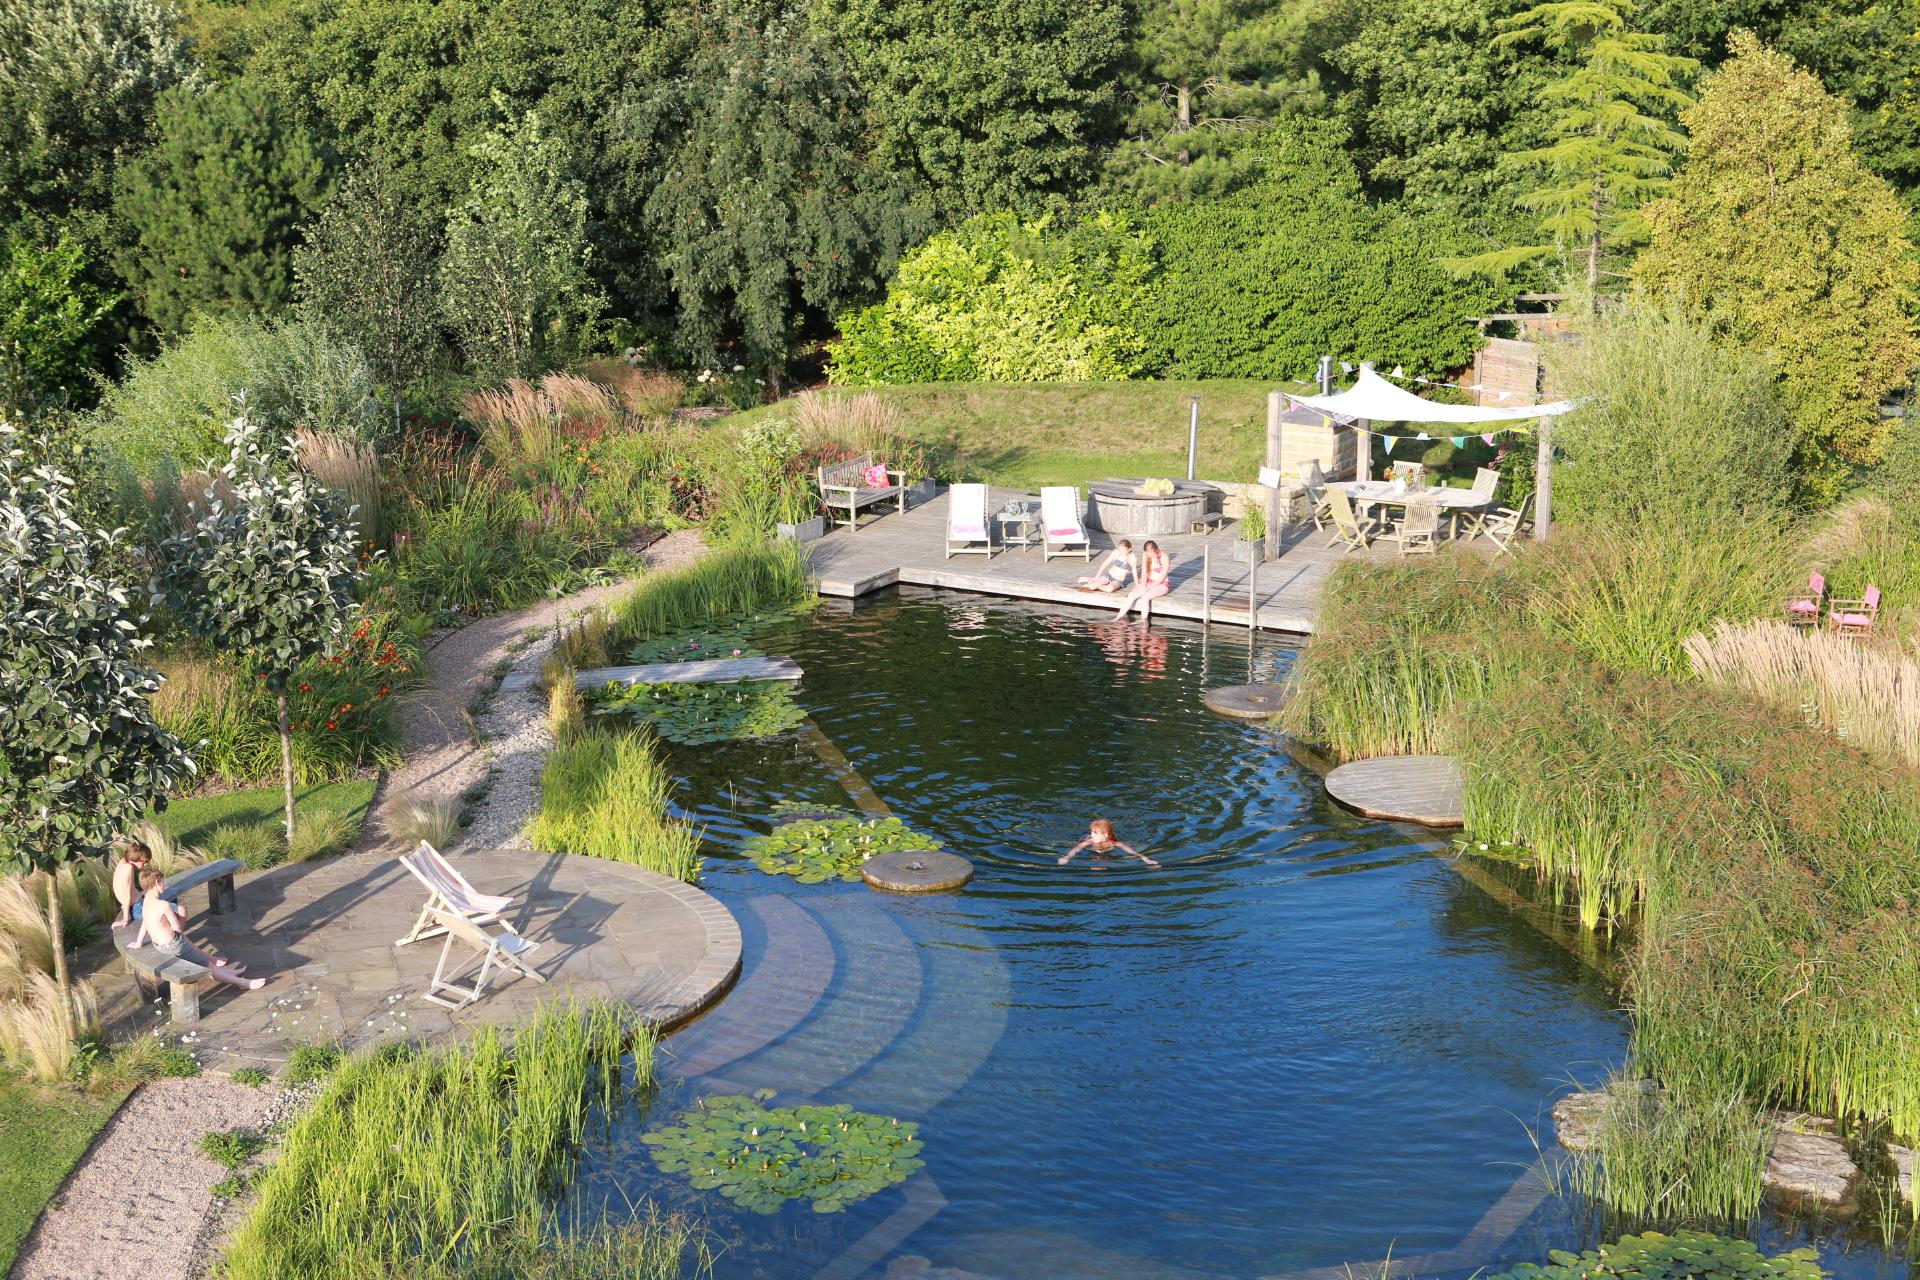 Bird's eye view Elllicar Natural Pool in summer